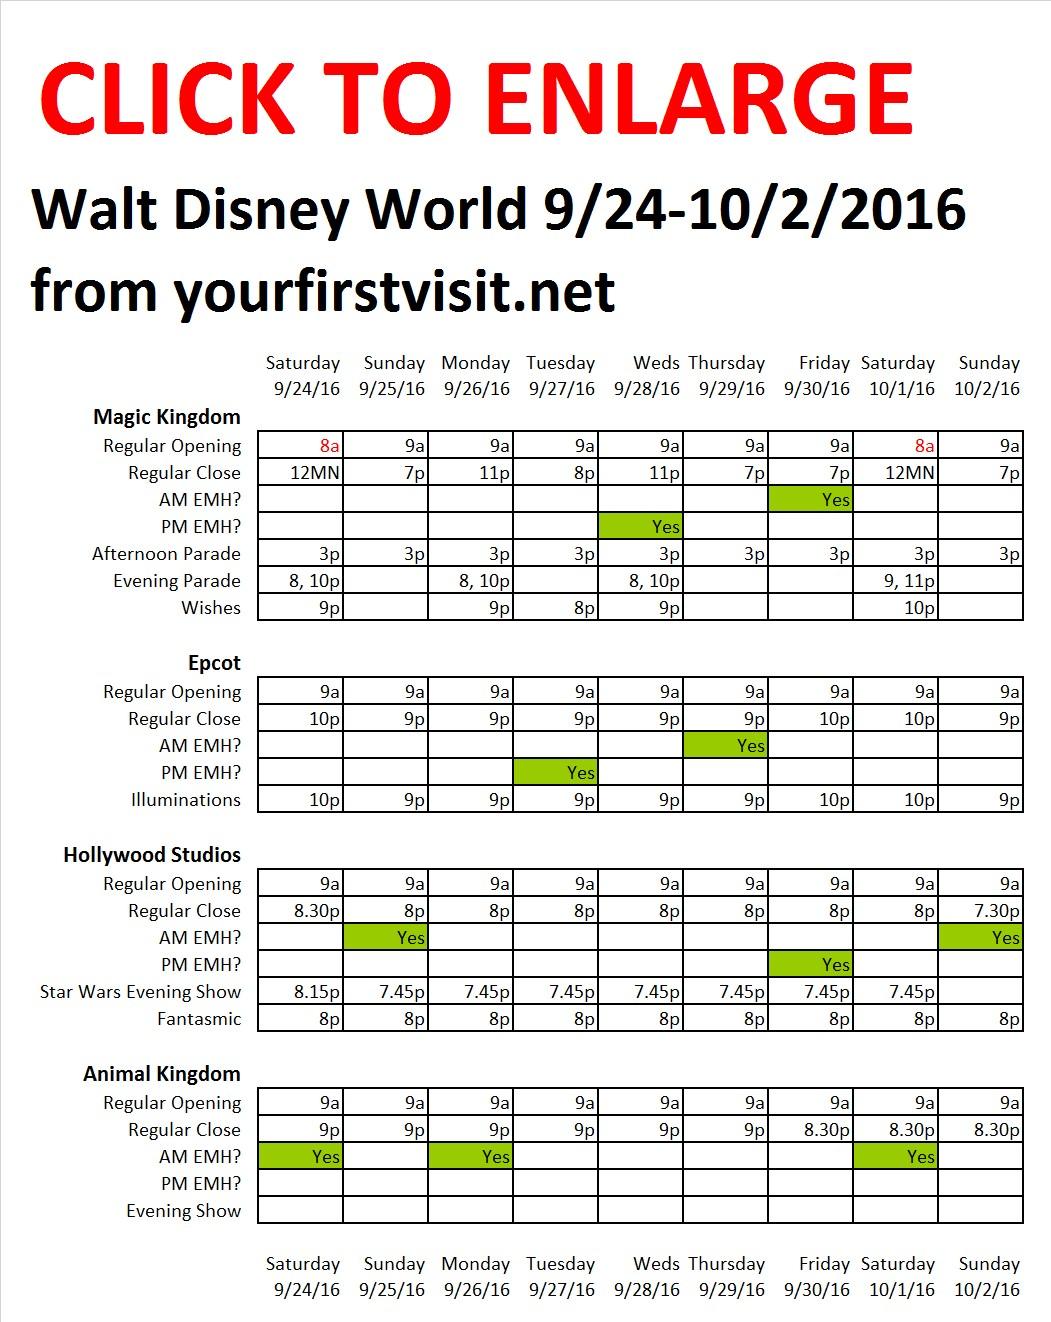 disney-world-9-24-to-10-2-2016-from-yourfirstvisit-net